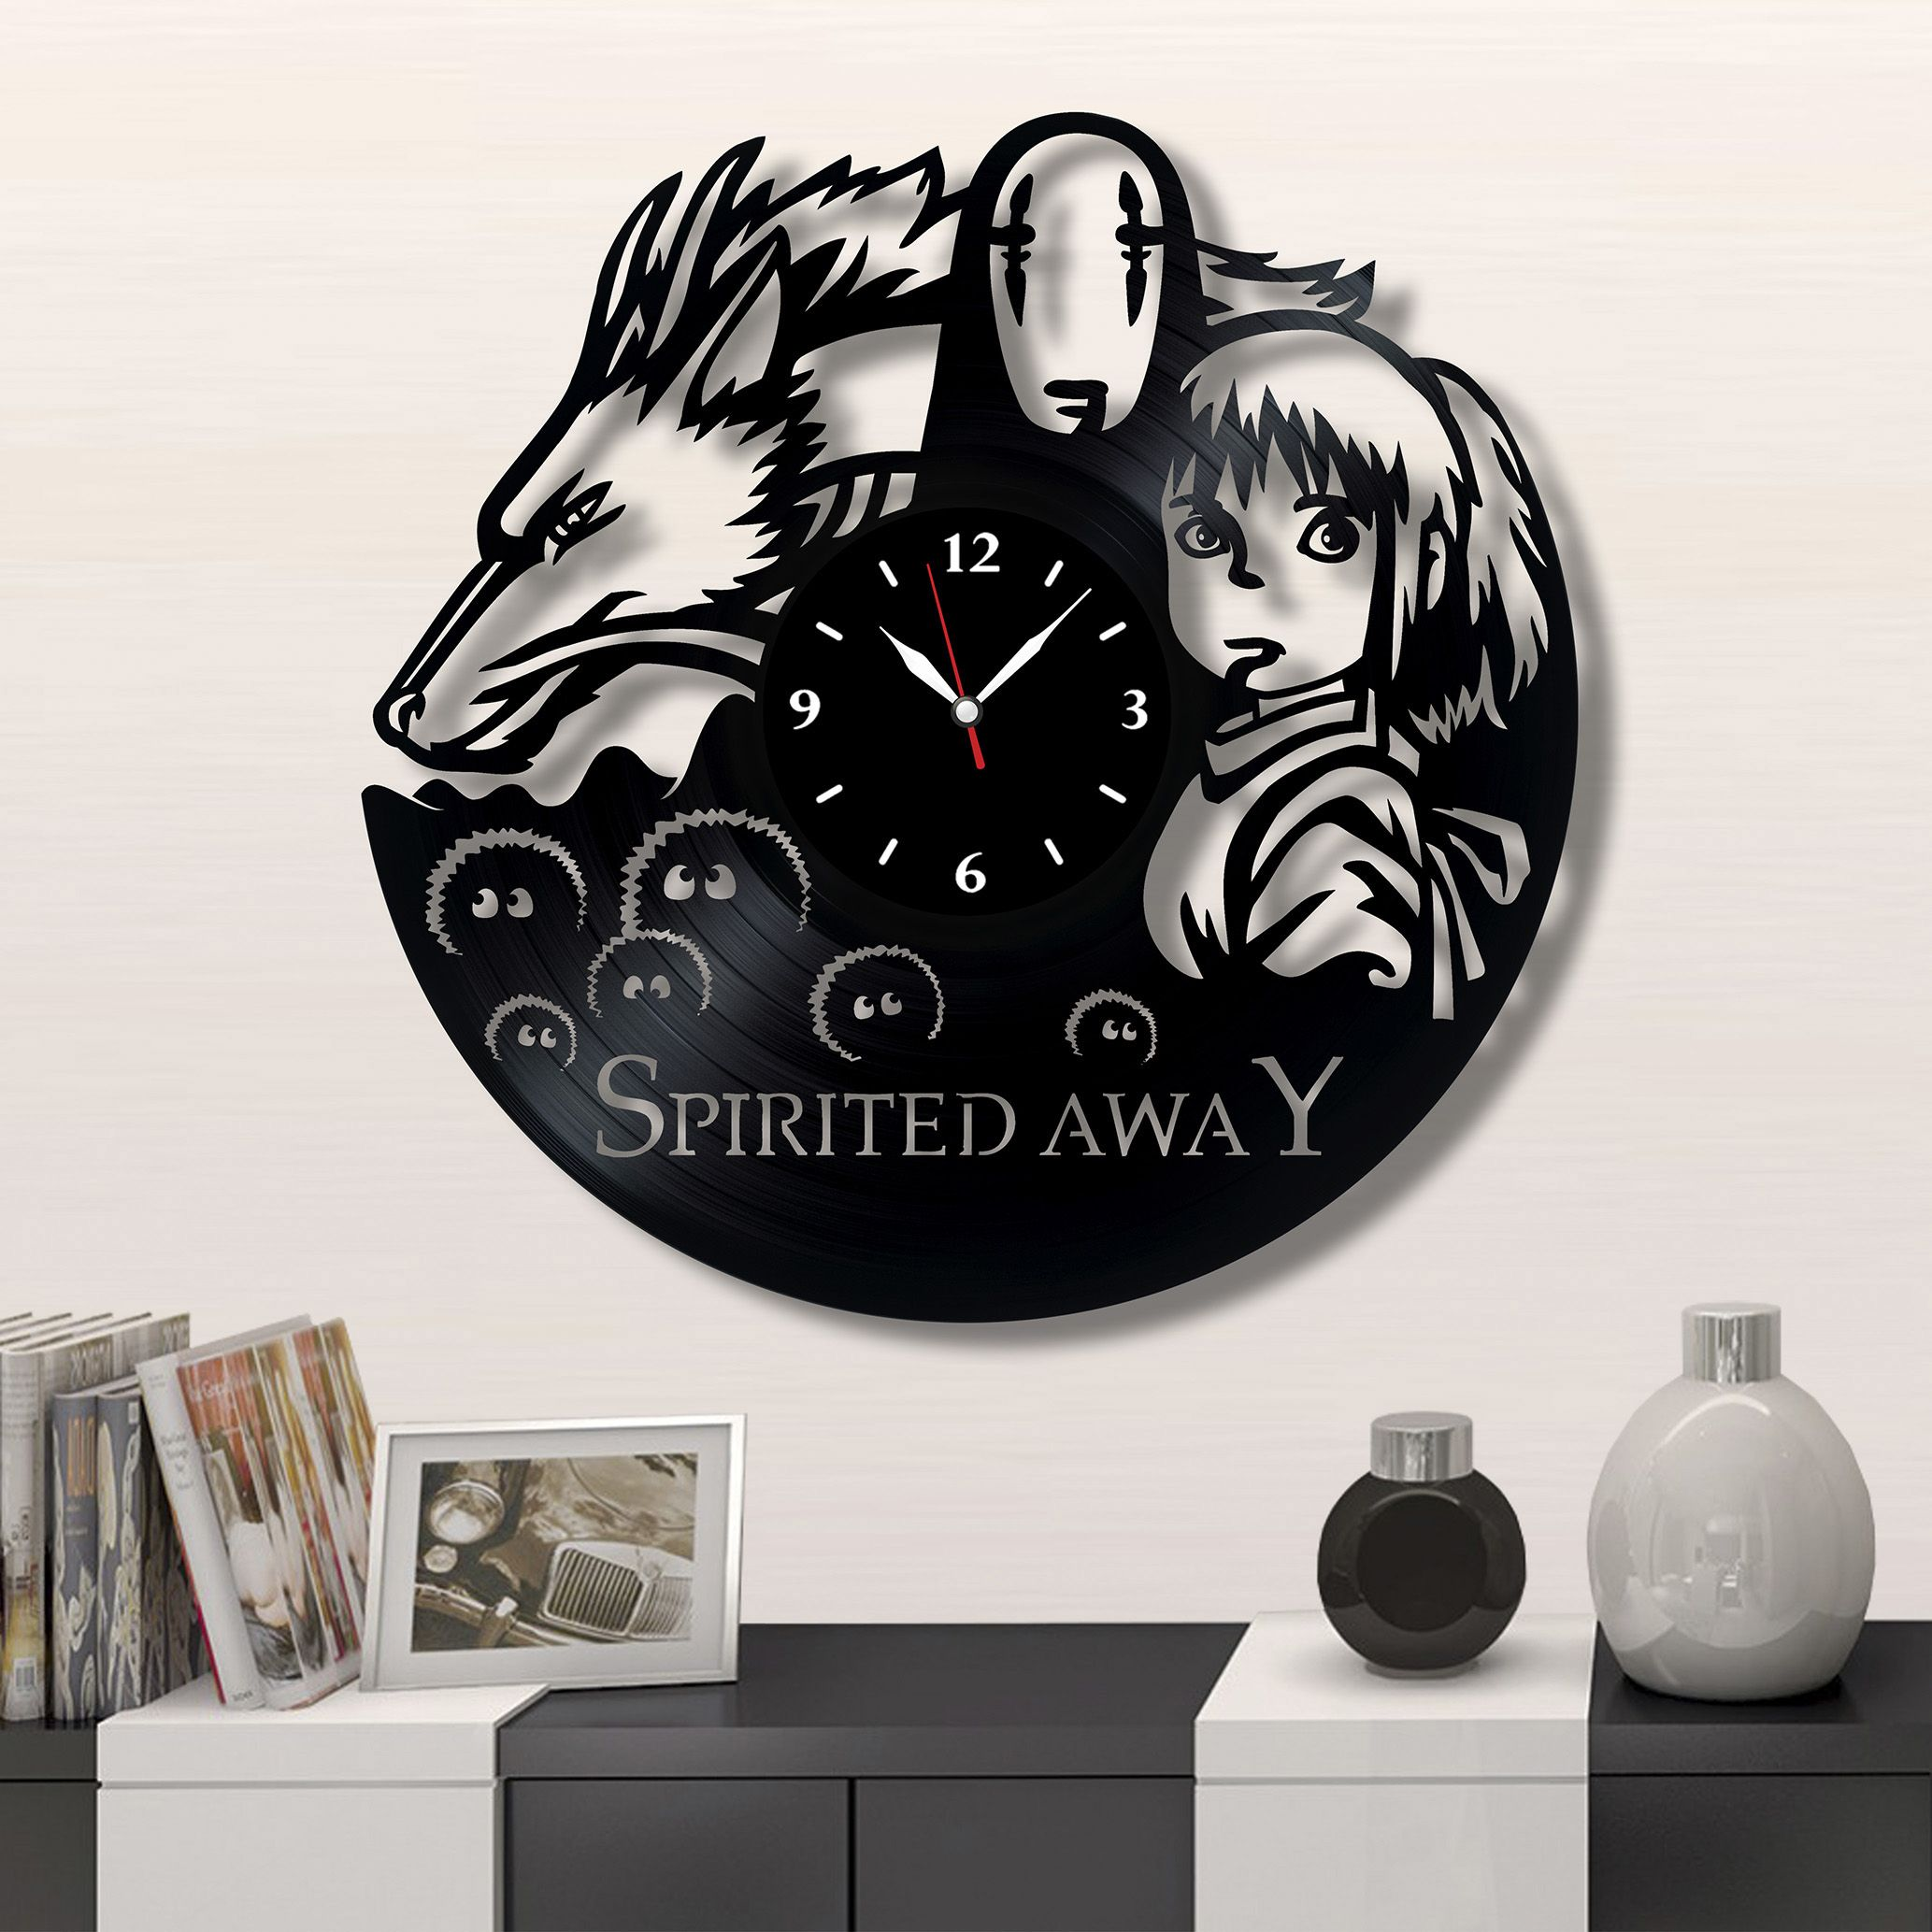 Spirited Away Vinyl Clock Record Wall Clock 12 The Best Gift For Decor Decor Homedecor Wallart Walldeco Vinyl Diy Crafts Record Crafts Vinyl Record Clock